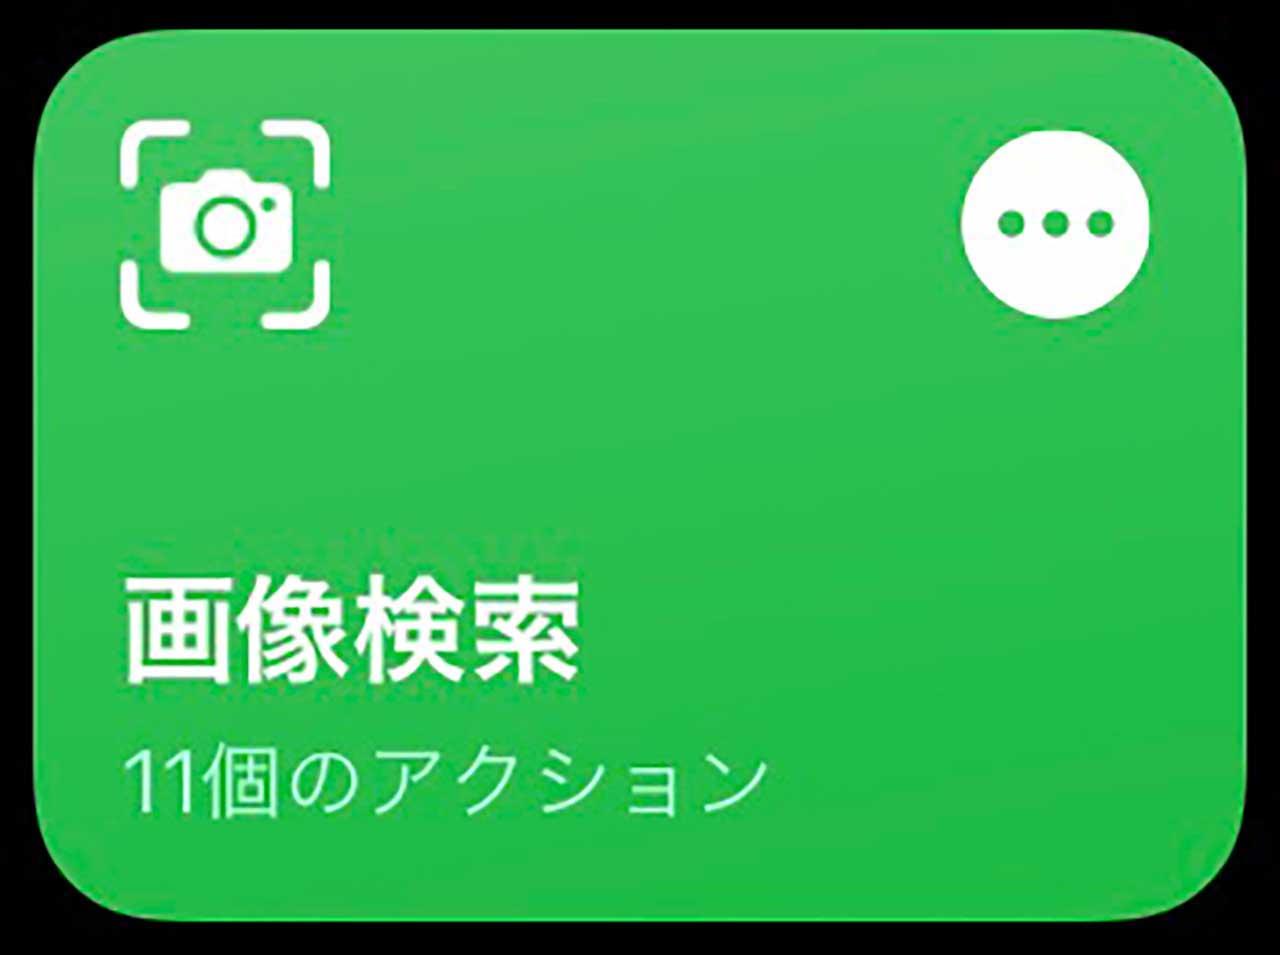 iPhone標準アプリで画像を使って検索する無料の方法